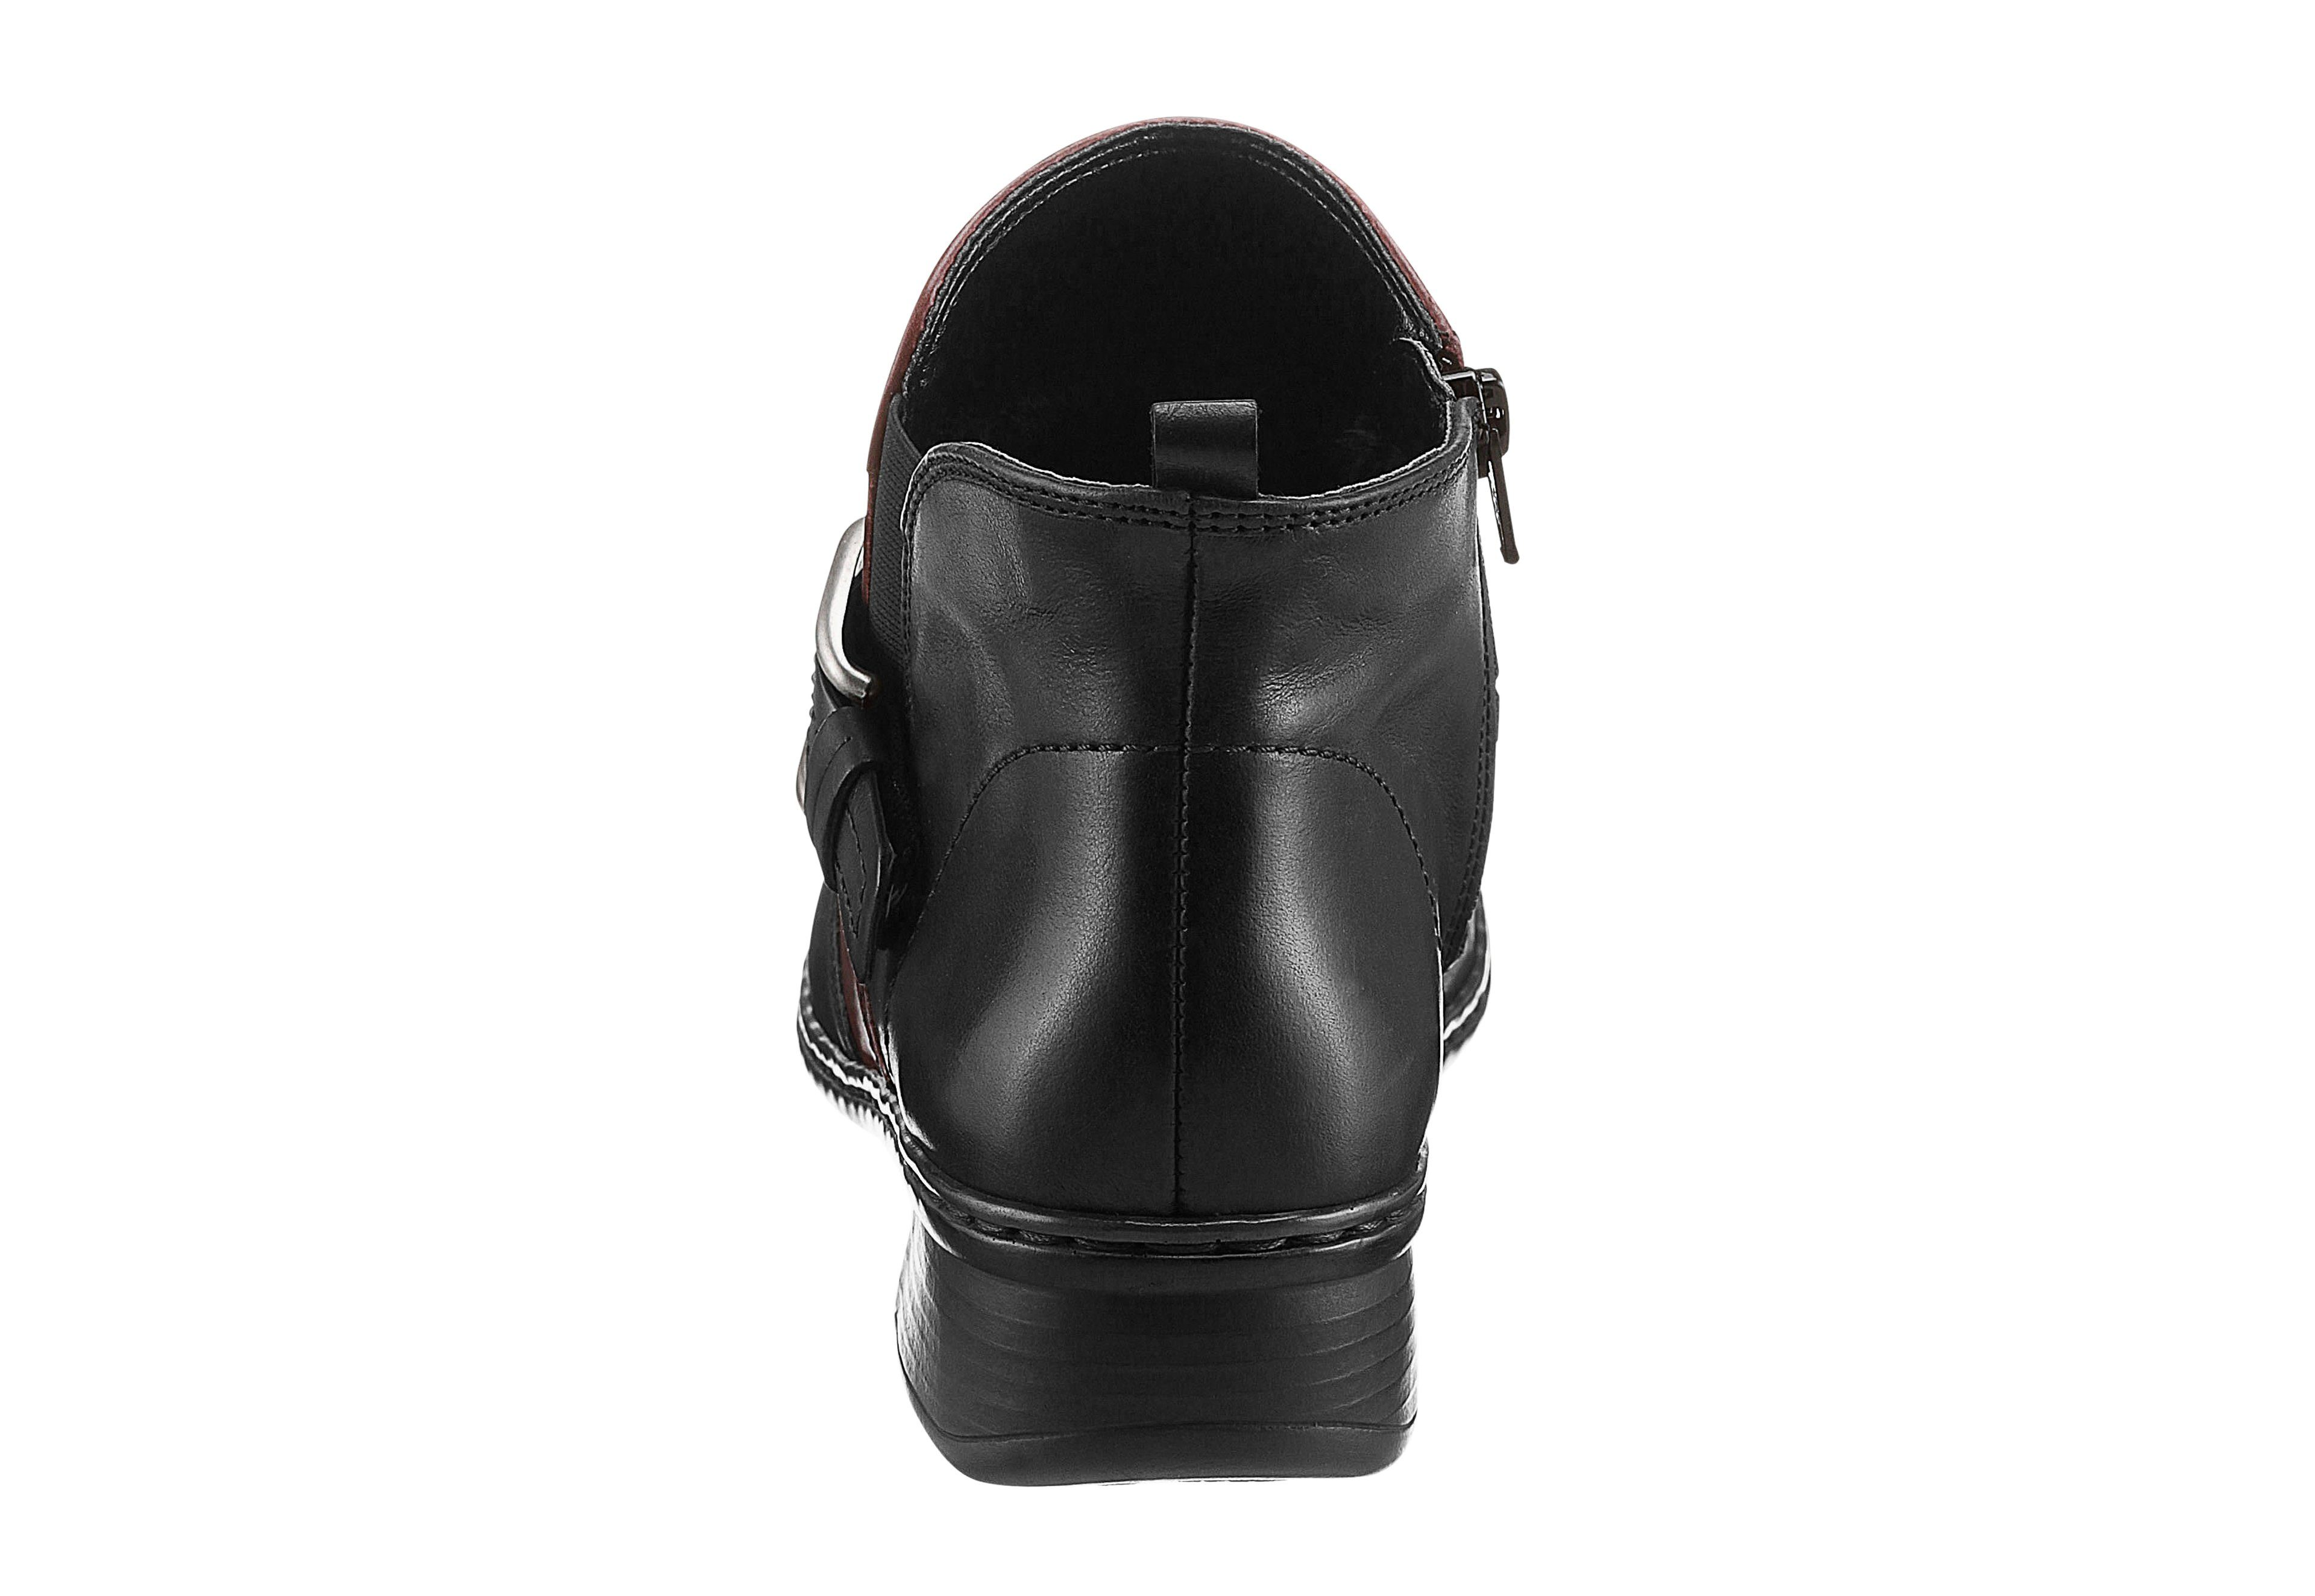 Jenny Stiefelette mit rutschhemmender PU-Laufsohle  schwarz-bordeaux